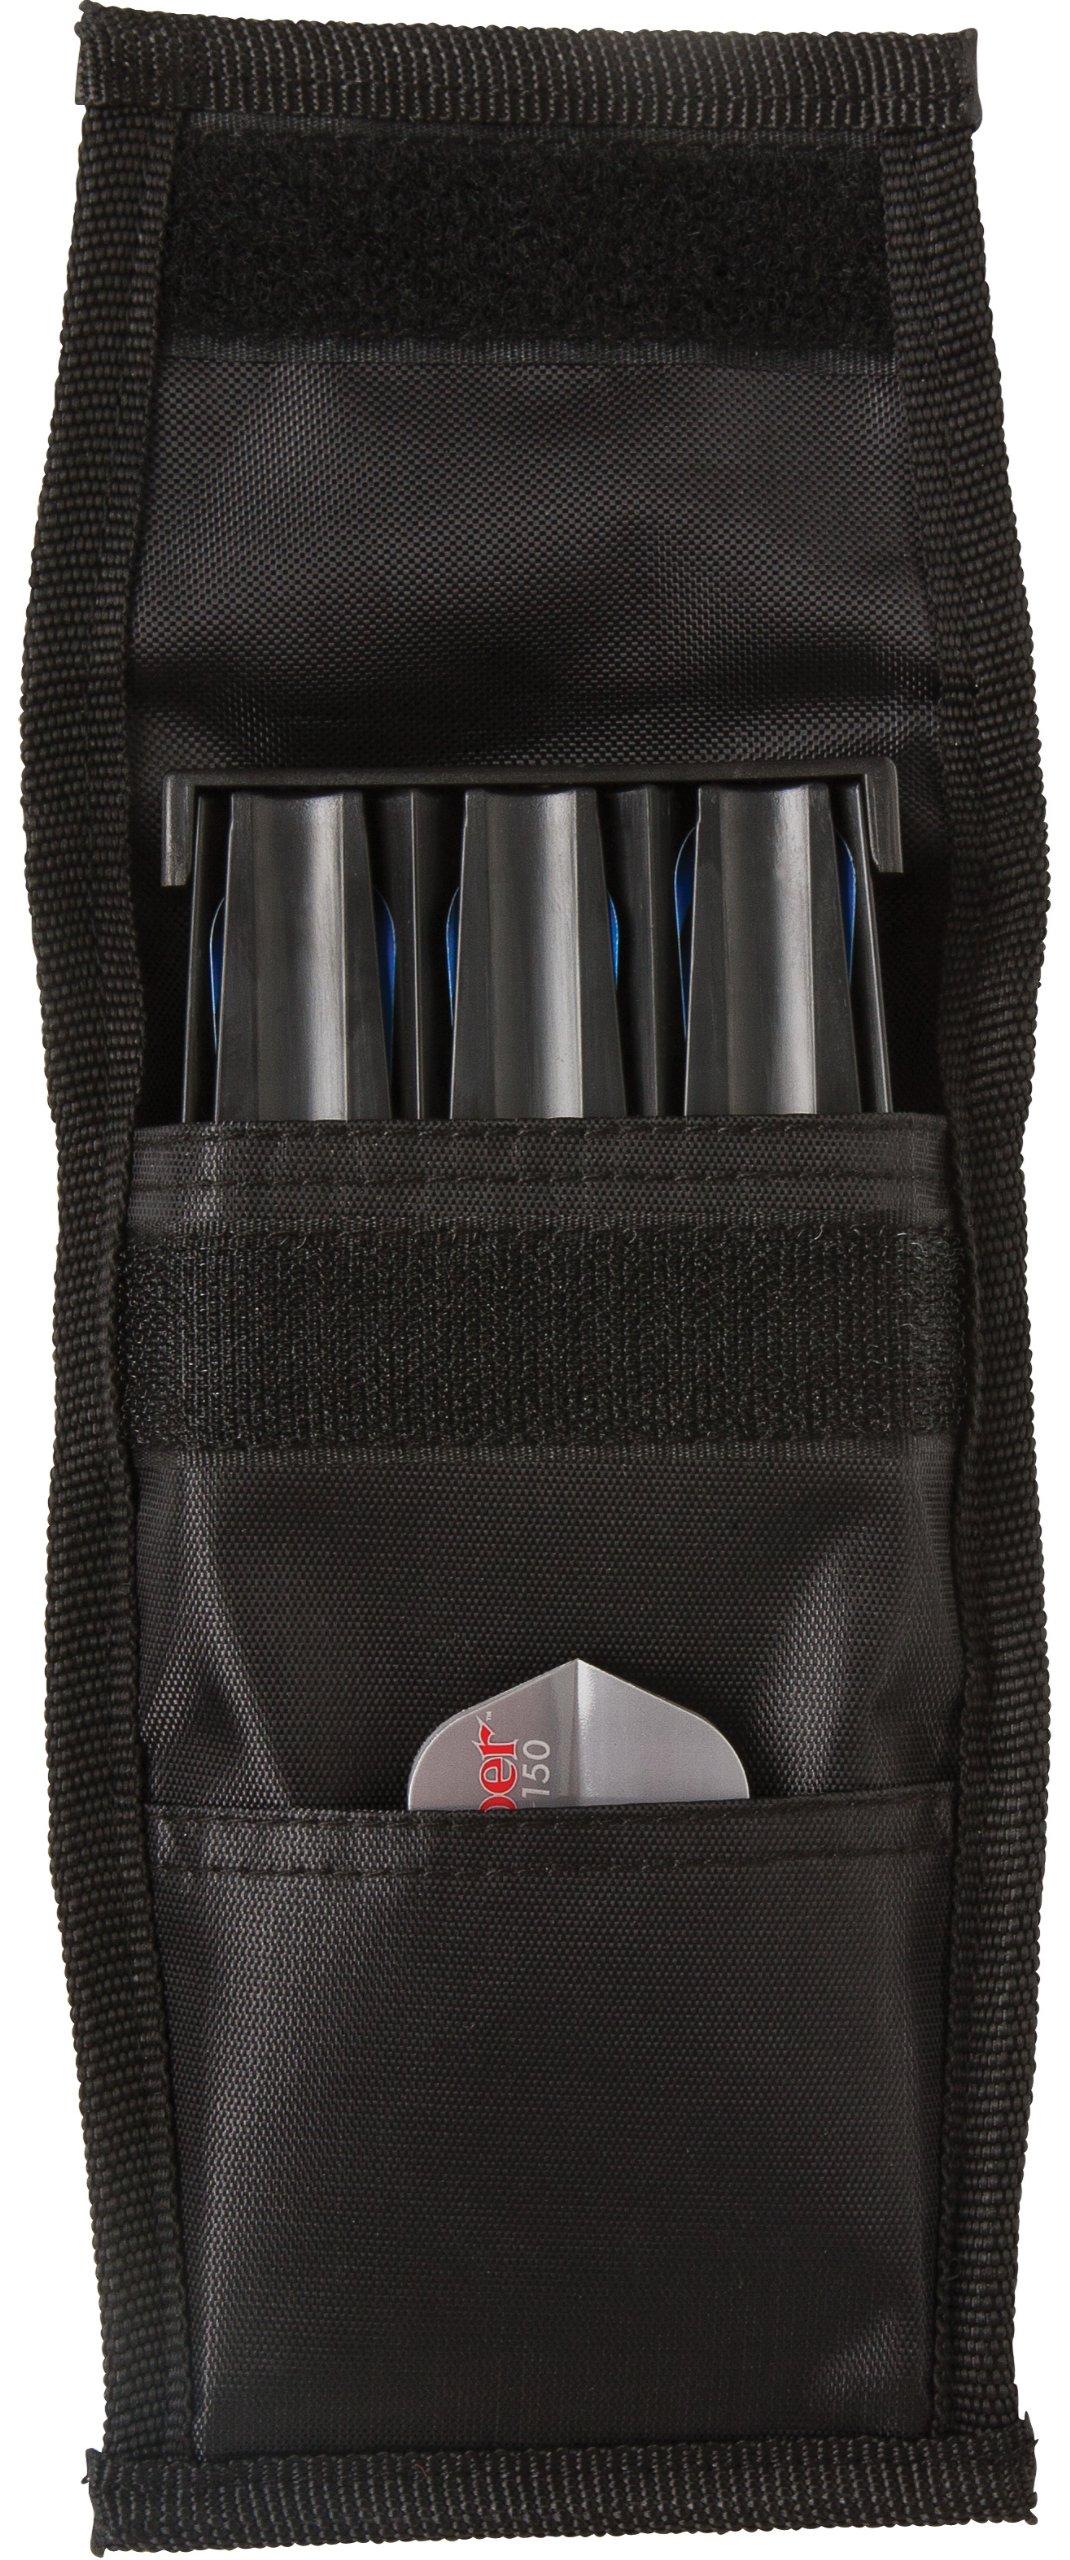 Casemaster Belt Clip 3 Dart Nylon Storage/Travel Case, Black by Casemaster by GLD Products